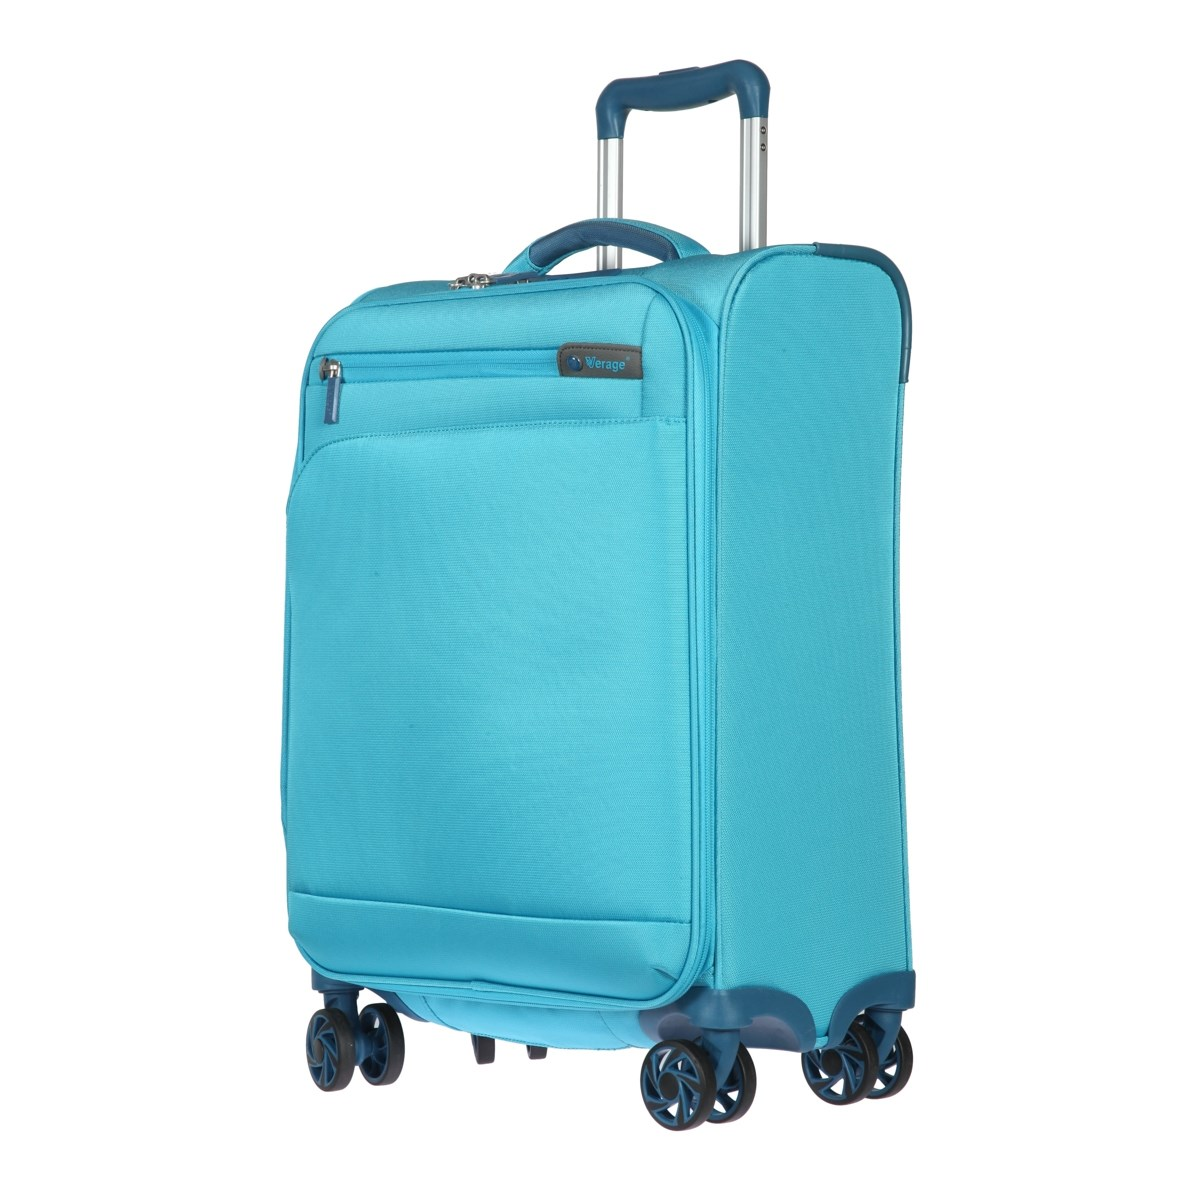 Suitcase-trolley Verage GM17016W20 water blue